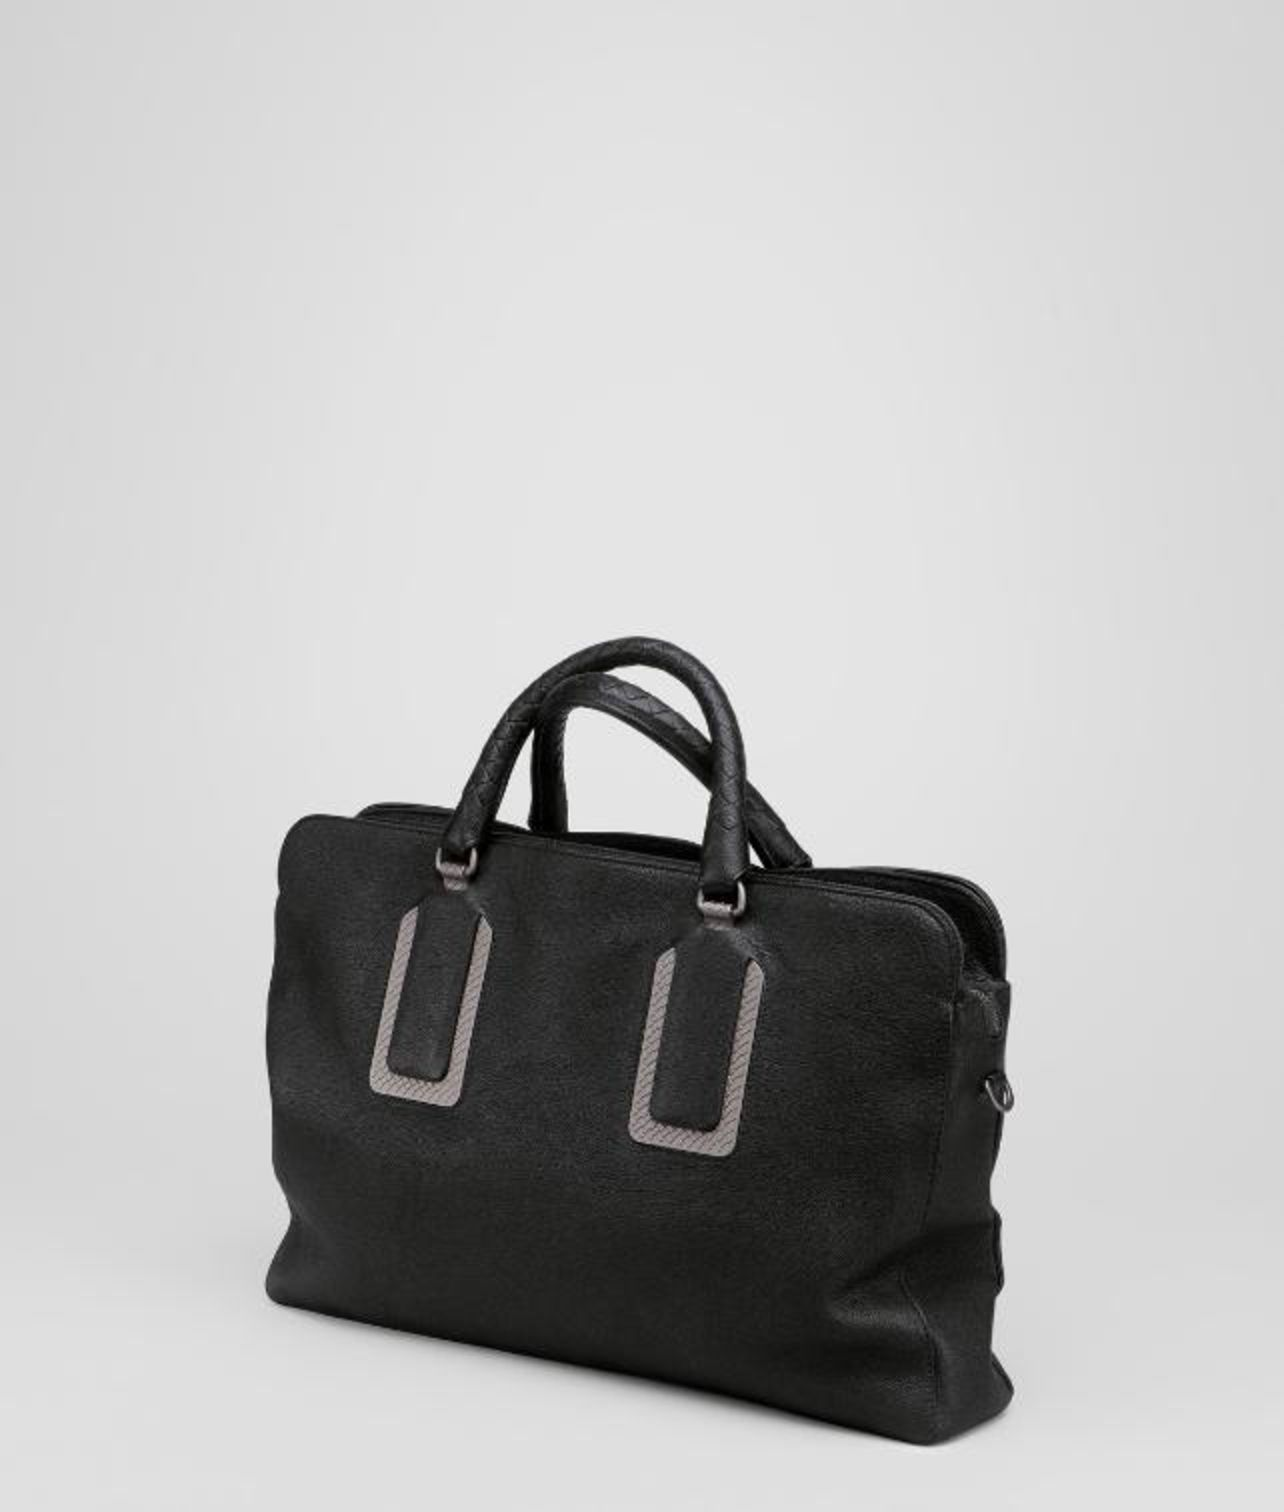 7929127ee5e1 Lyst - Bottega Veneta Nero Buffalo Leather Metal Briefcase in Black ...